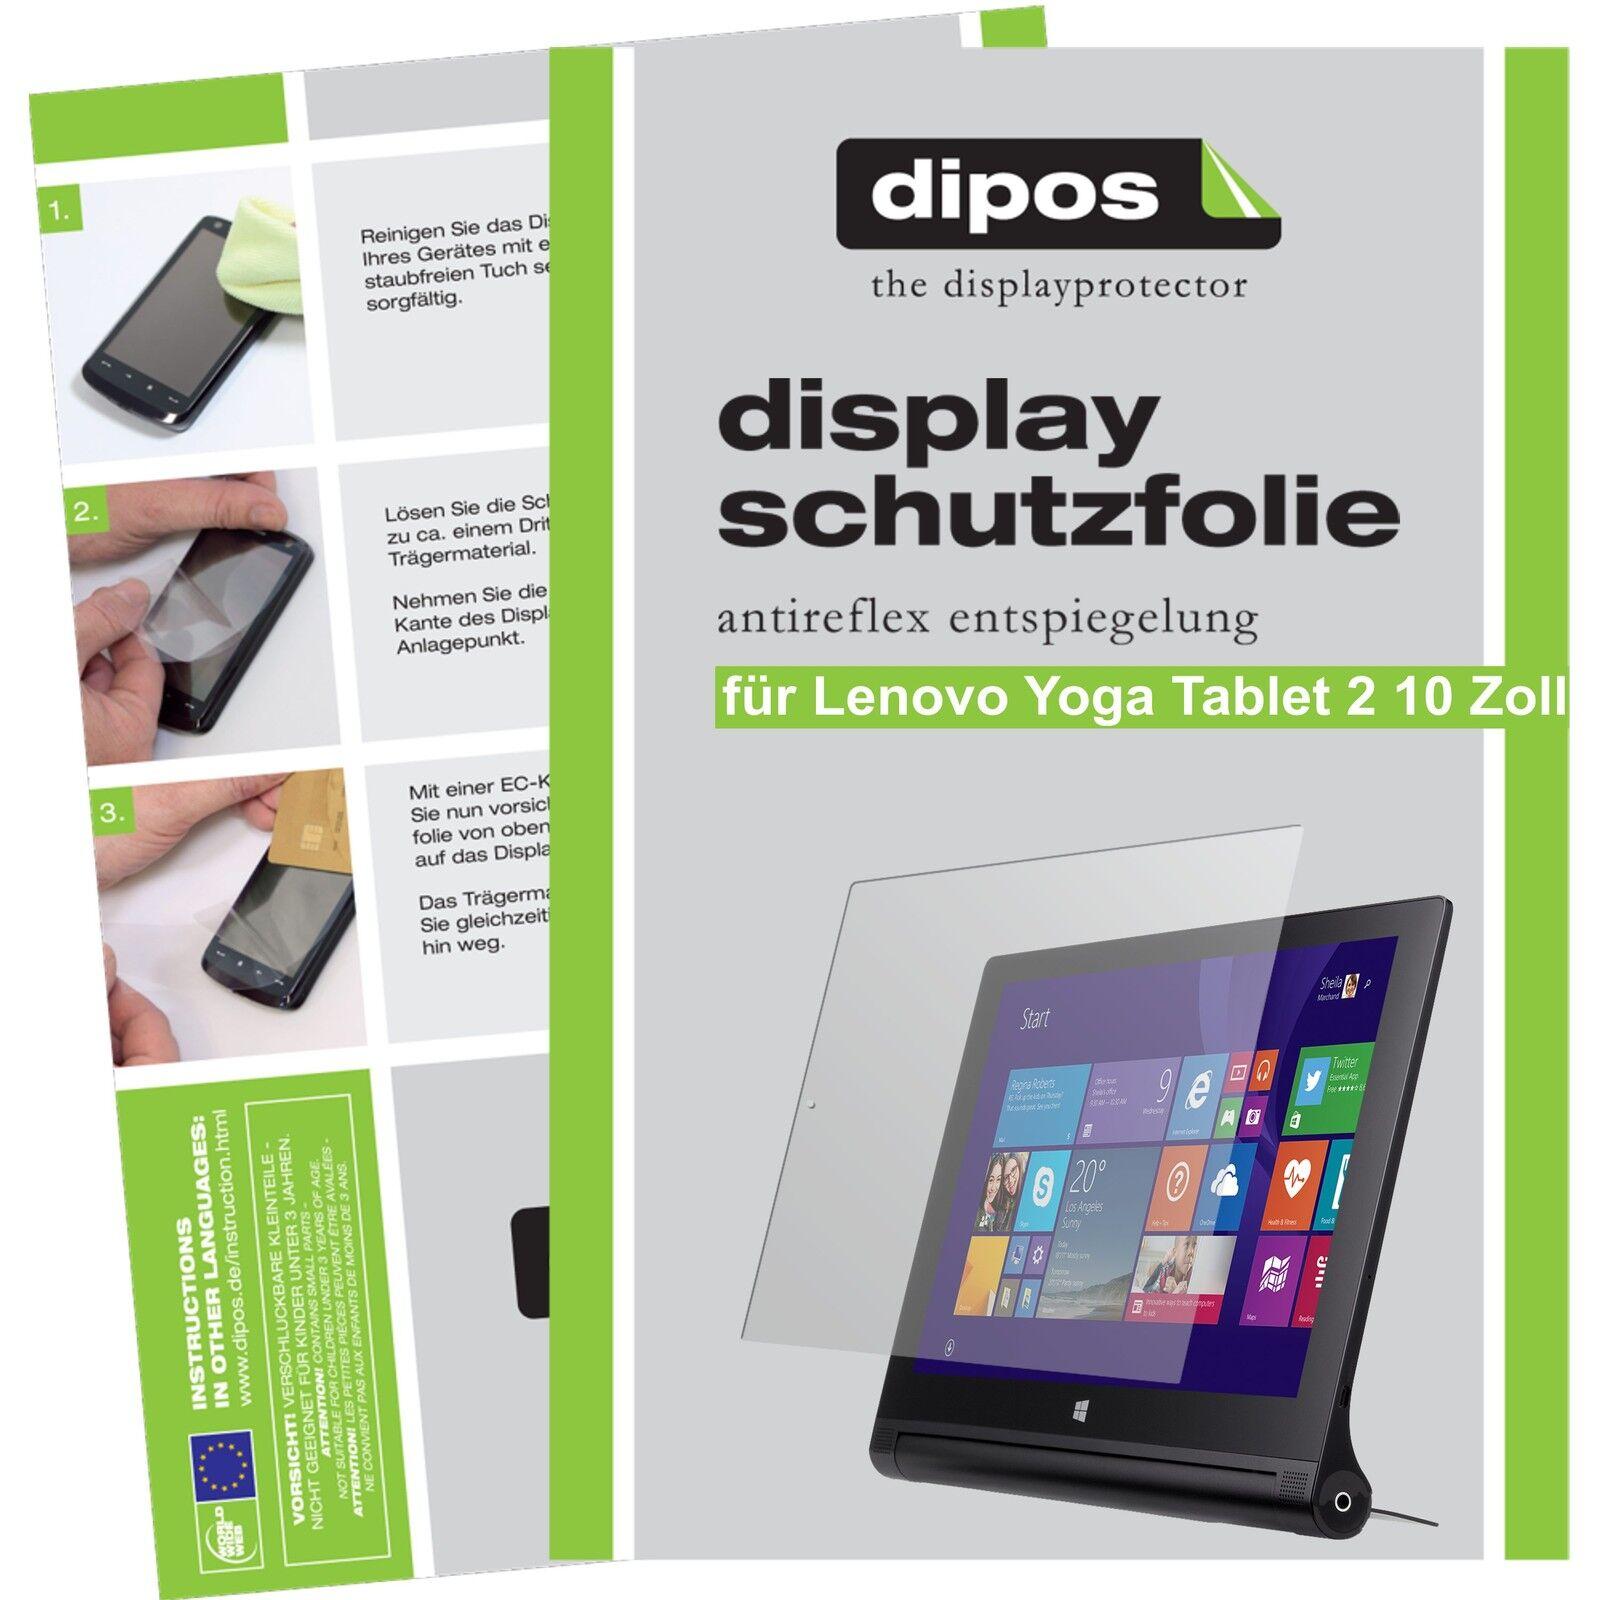 2x dipos Lenovo Yoga Tablet 2 10.1 matt Displayschutzfolie Antireflex Testsieger